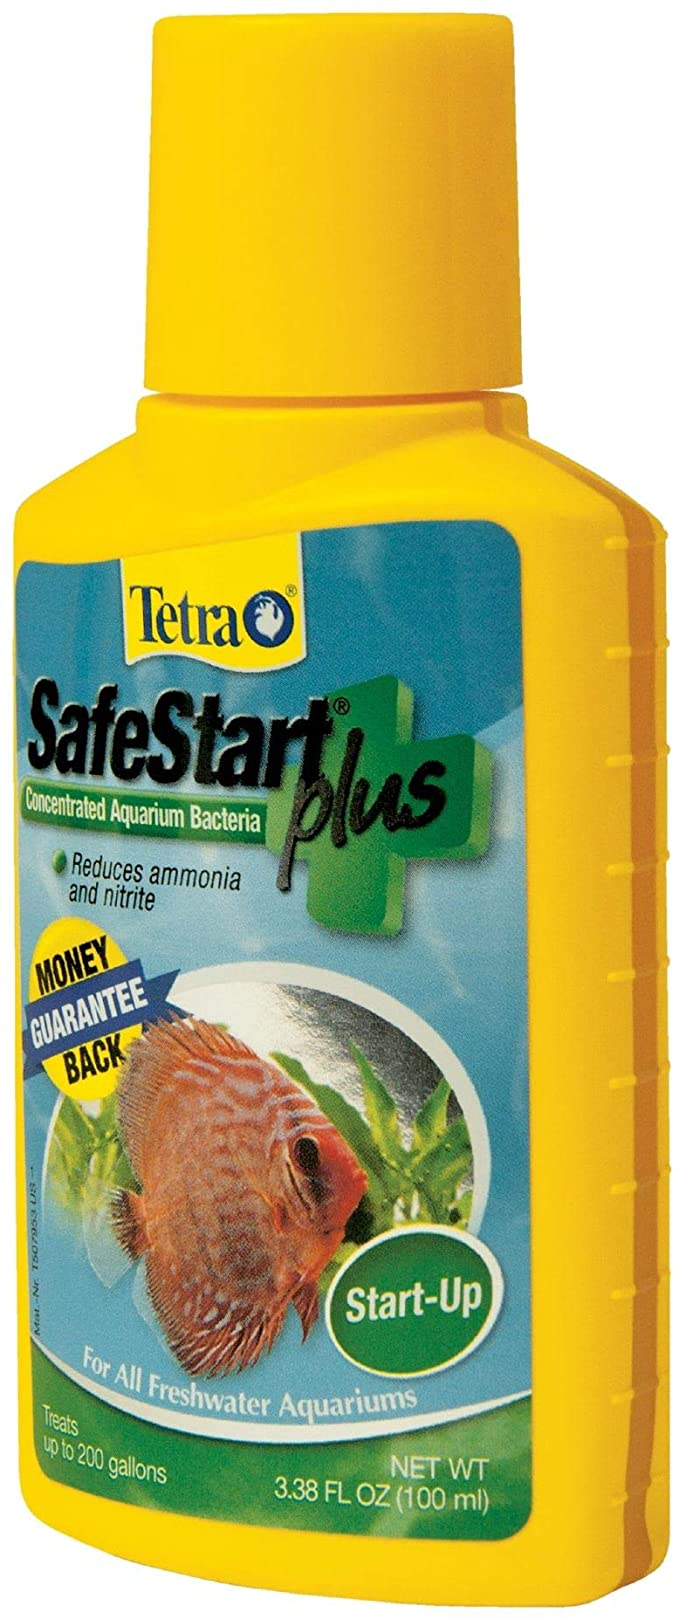 Tetra 77961 product image 9